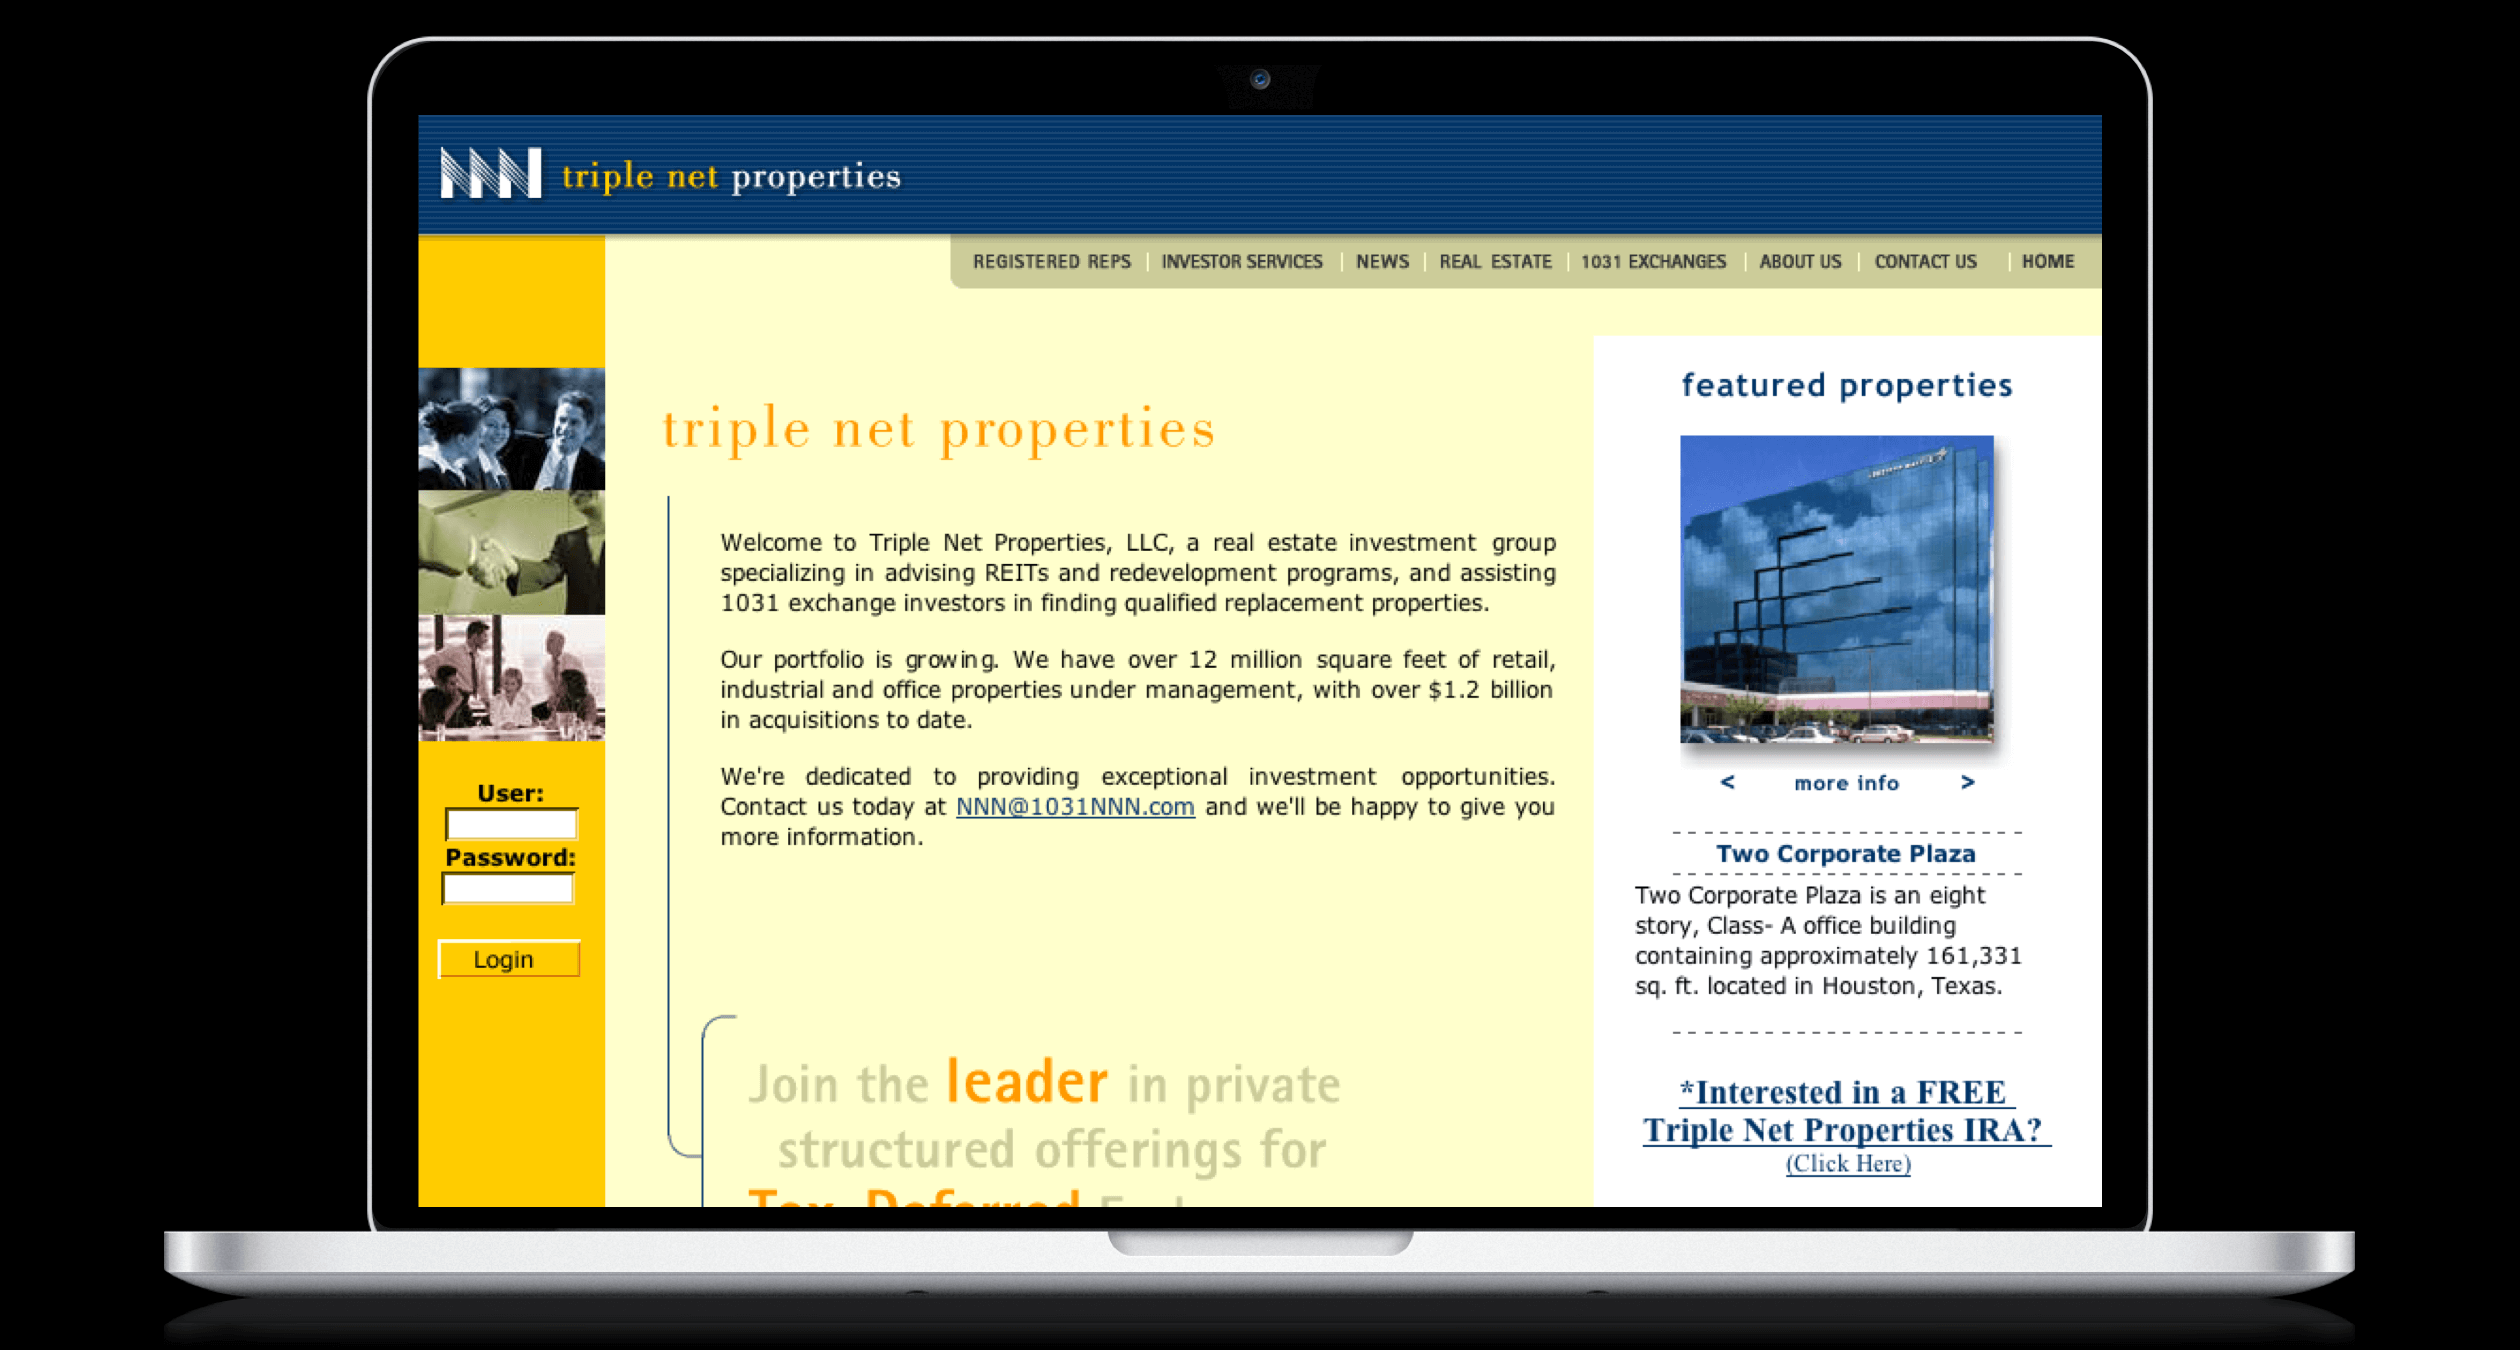 PHX-Web-Agency-Triple-Net-Properties-NNN-Real-Estate-Invetment-Trusts-REITS-1031-Exchange-Website-Design-Before